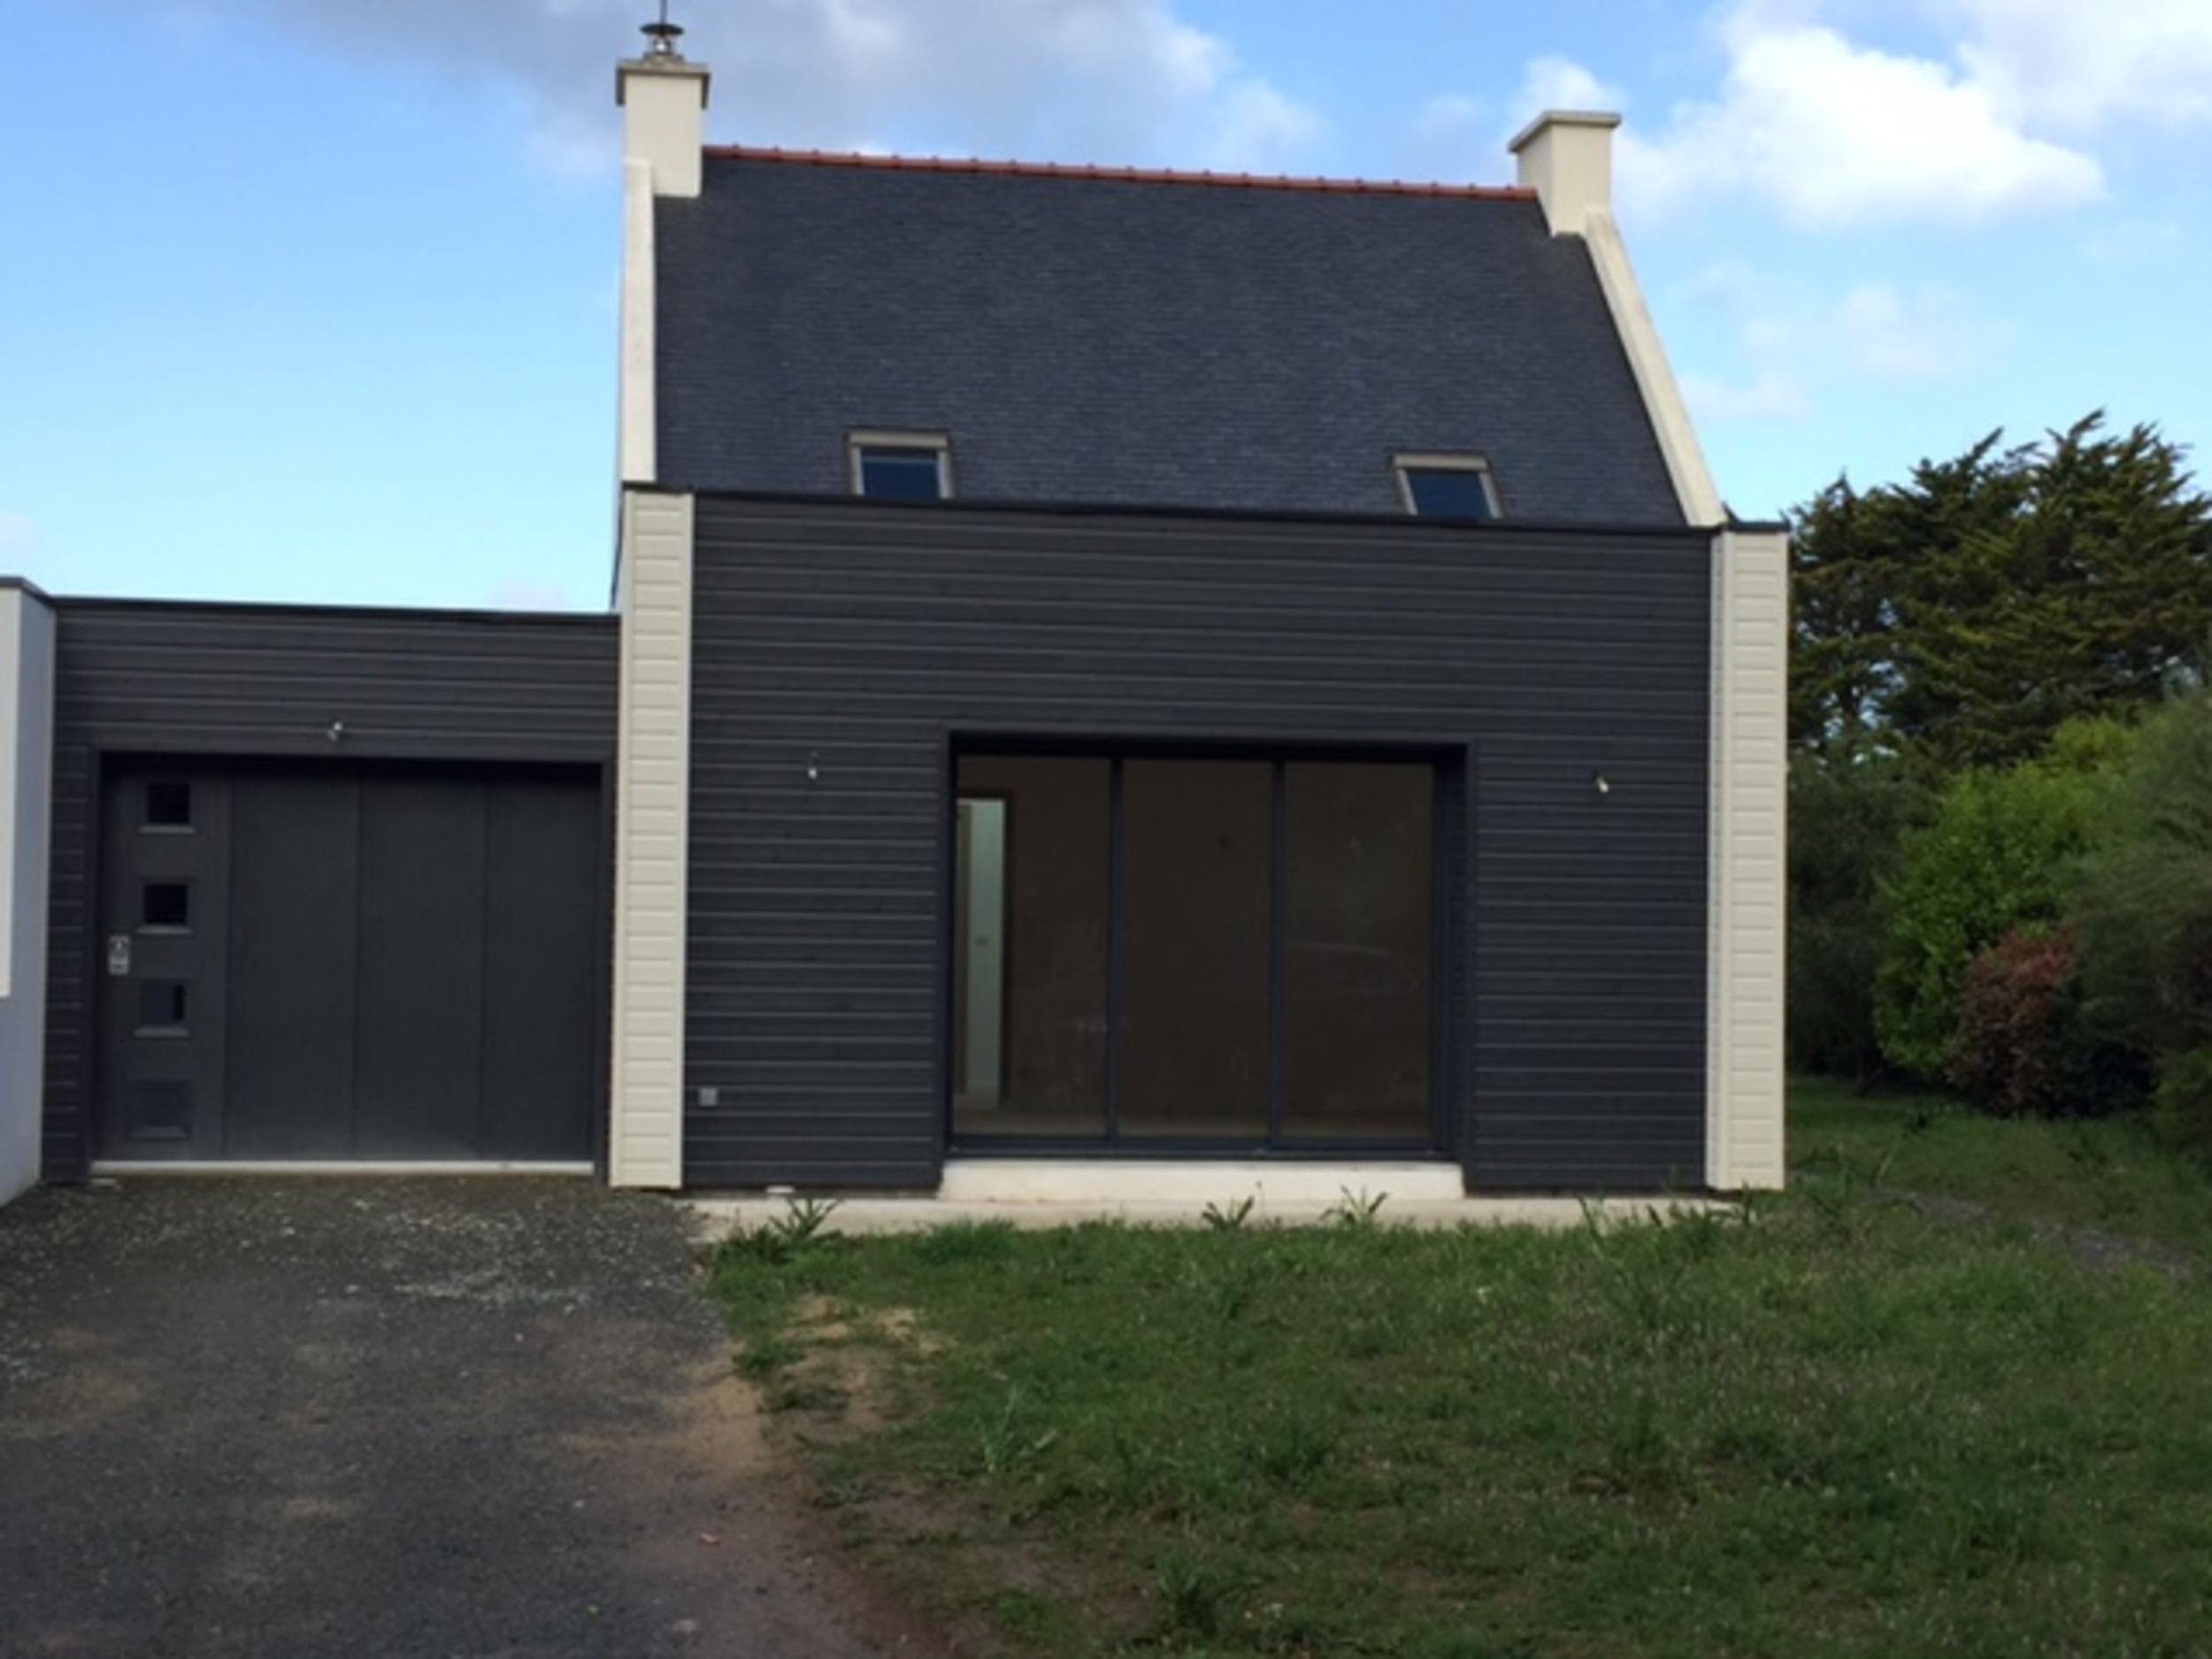 Extension bois et bardage bois garage